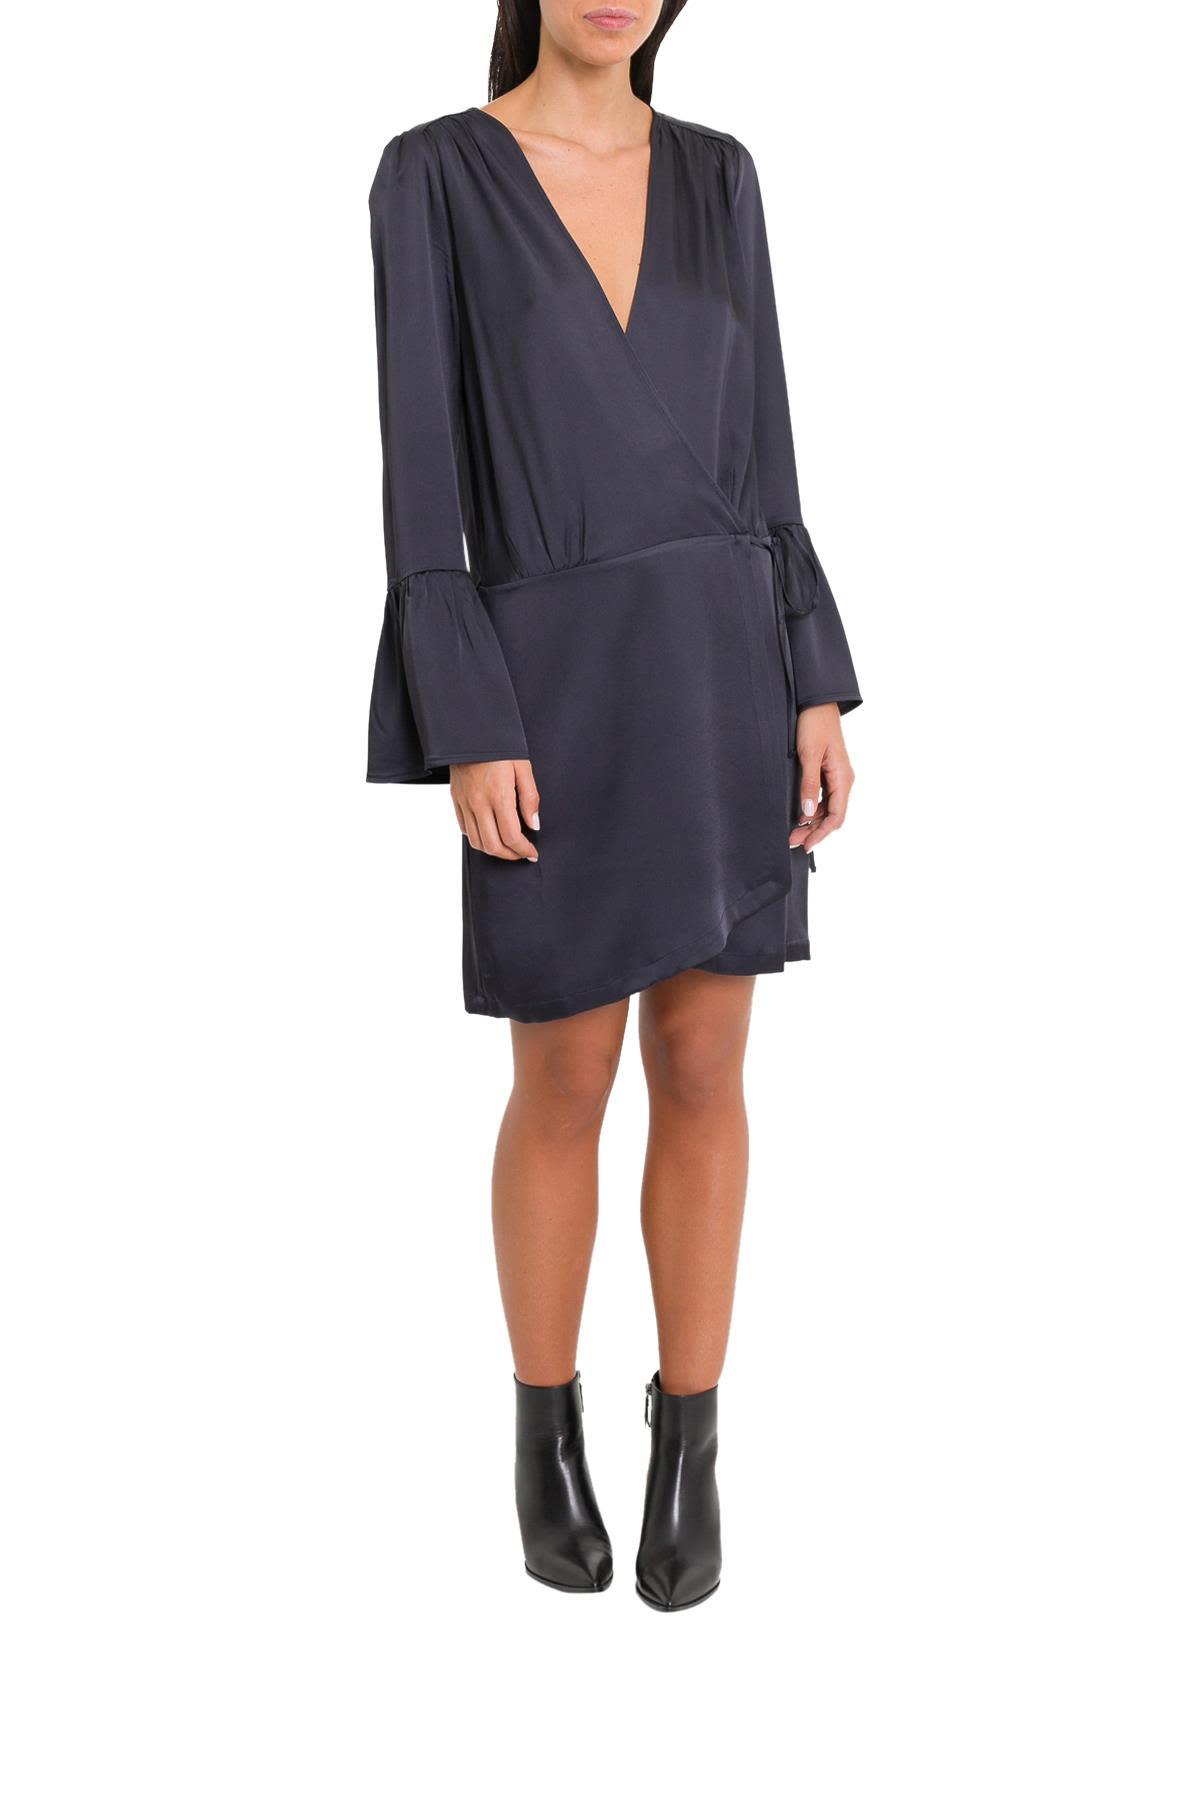 SEMICOUTURE Dress With V-neckline